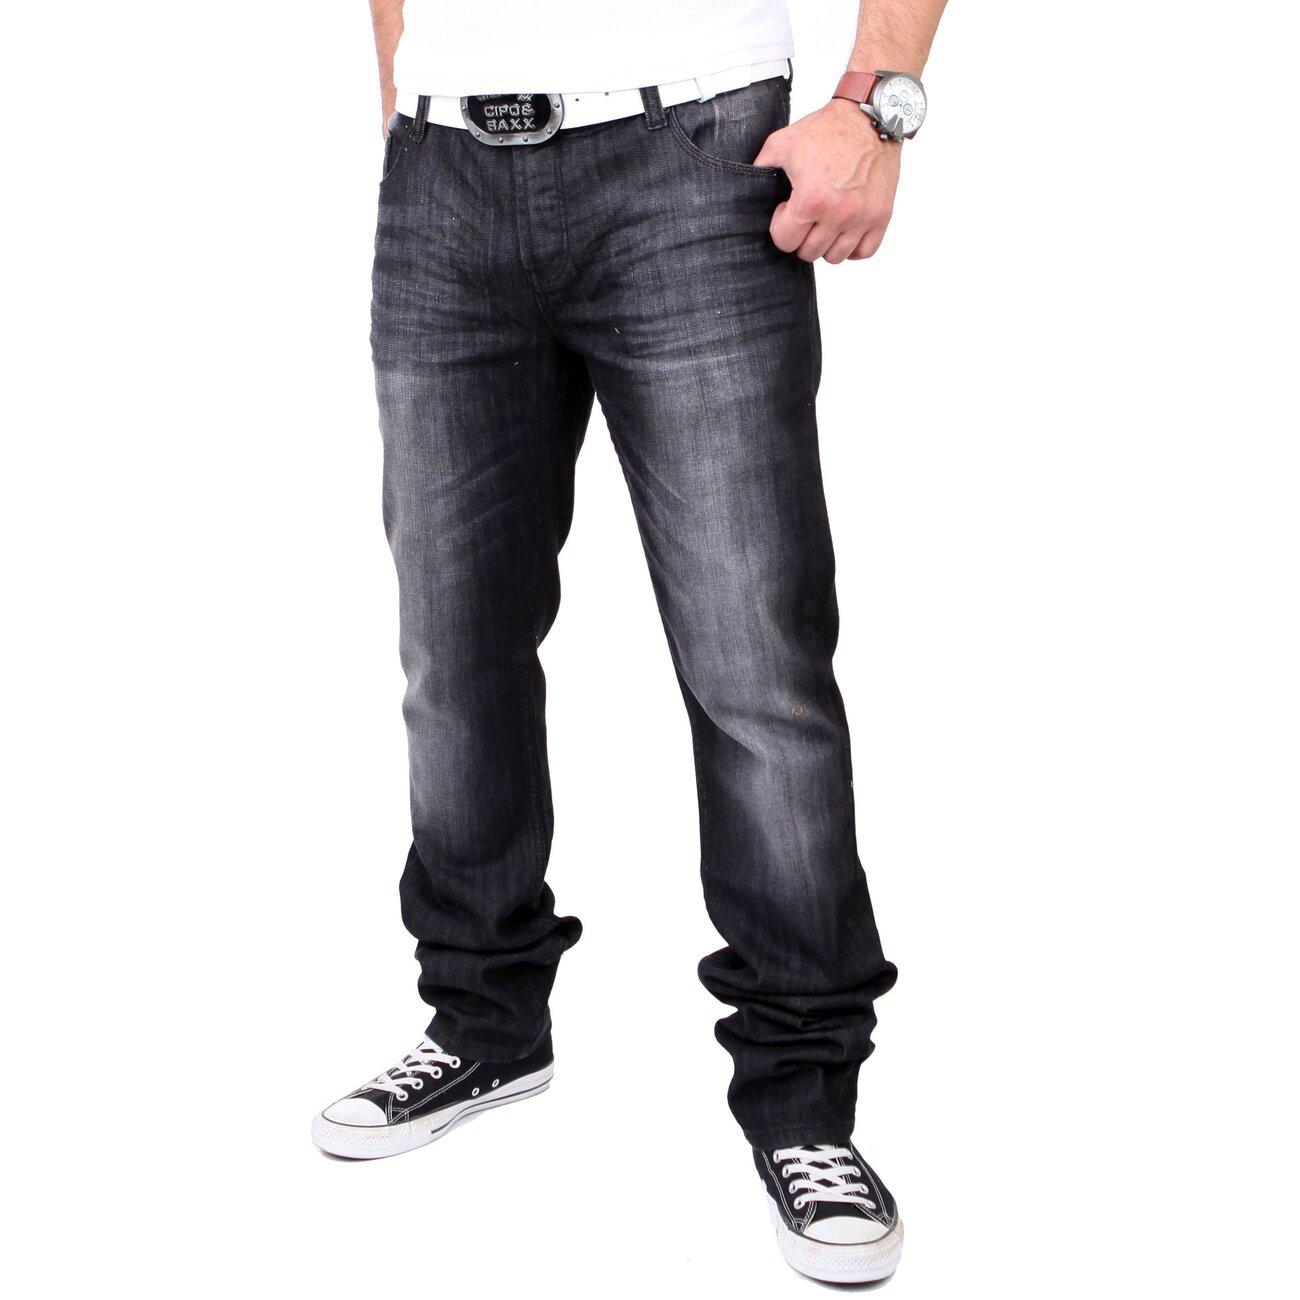 tazzio herren jeans dark denim used look jeanshose tz 524. Black Bedroom Furniture Sets. Home Design Ideas